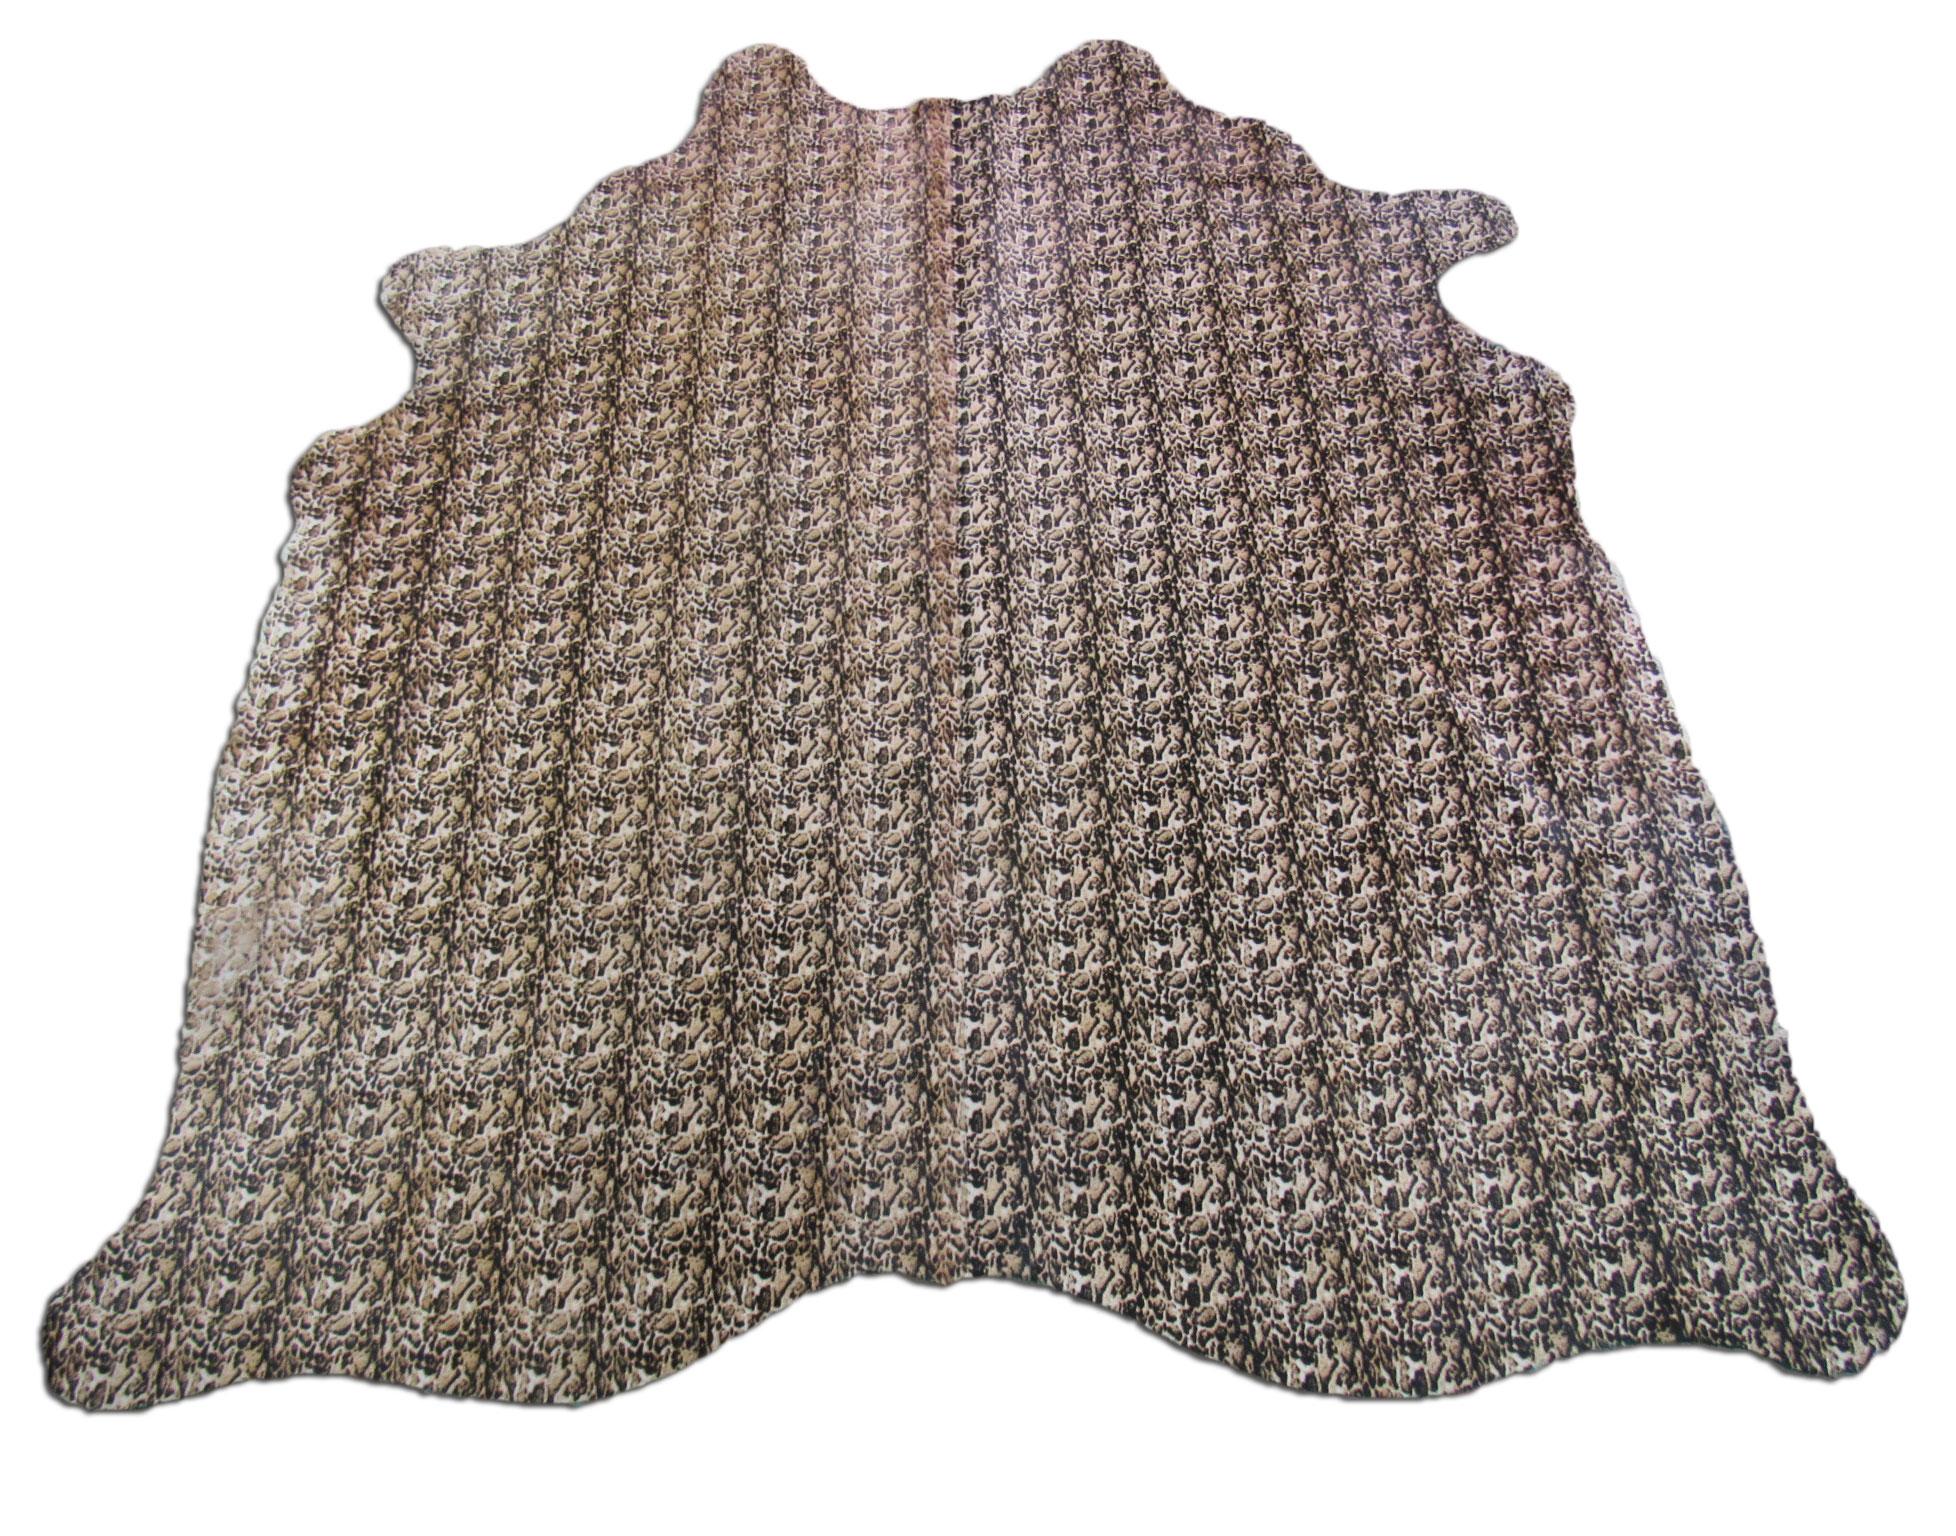 A-969 Snow Leopard Print Cowhide Rug Size: 7' X 6 1/2'